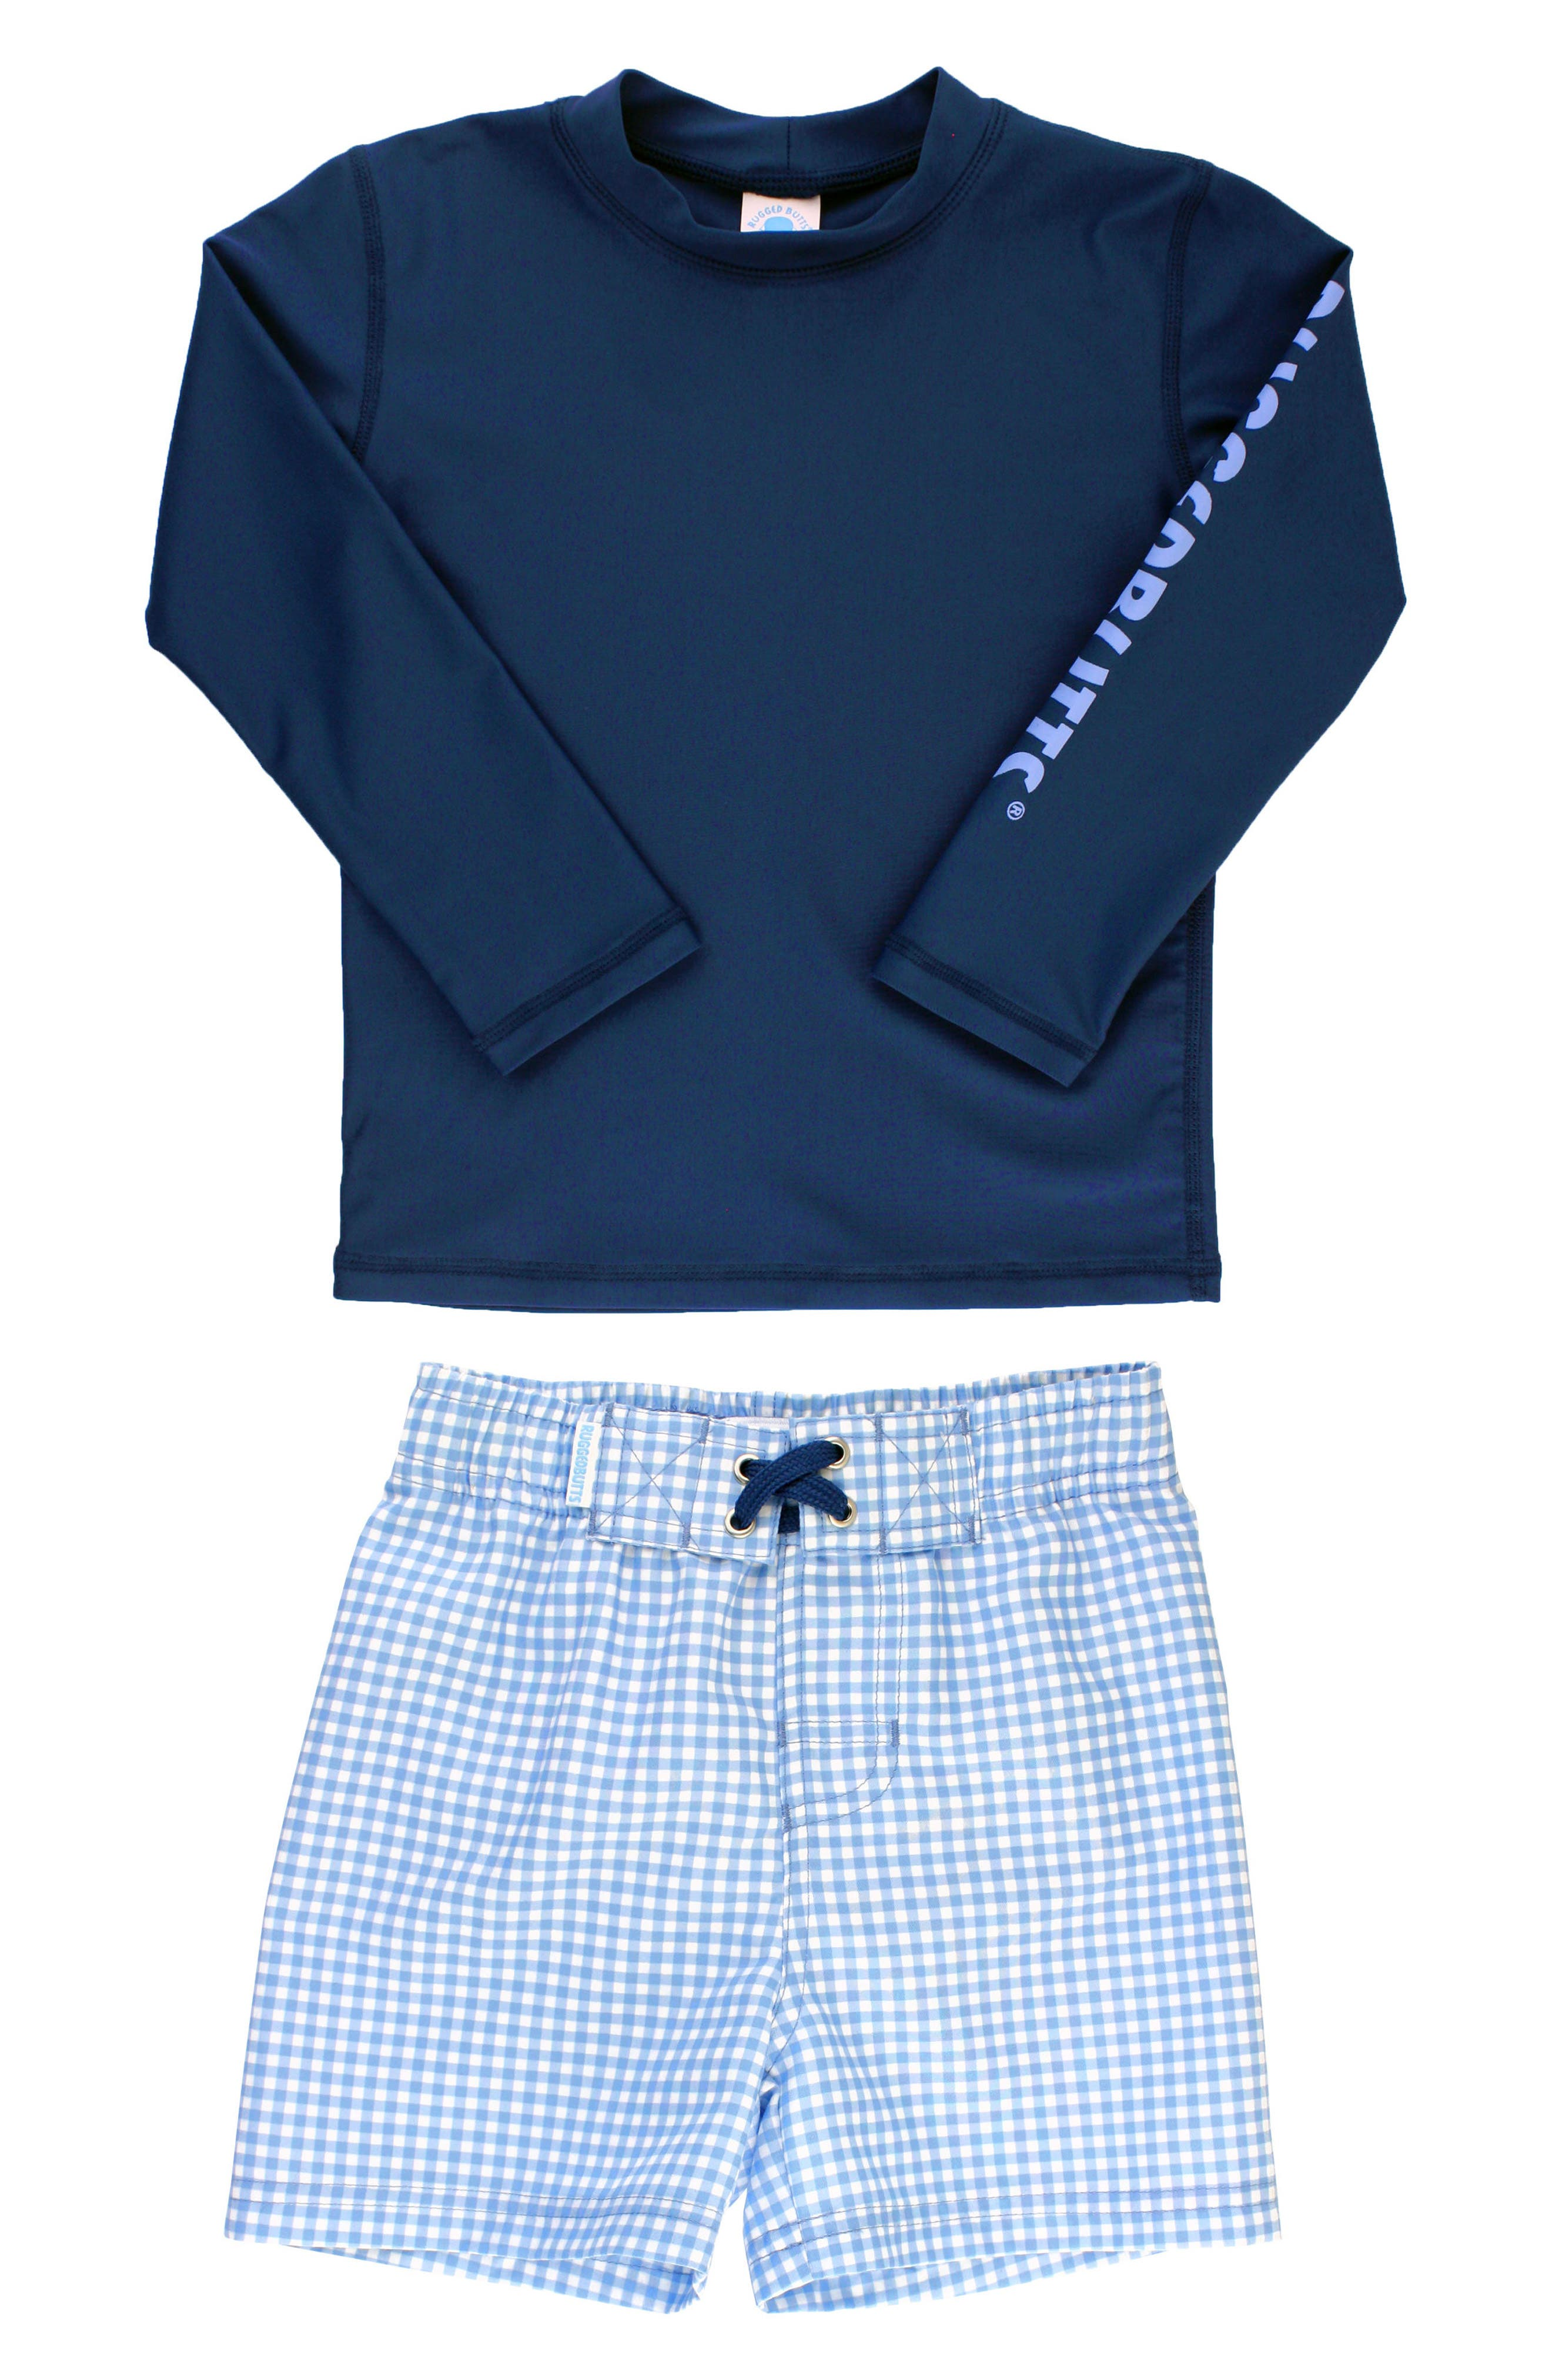 Alternate Image 1 Selected - RuggedButts Long Sleeve Rashguard & Gingham Board Shorts Set (Toddler Boys & Little Boys)